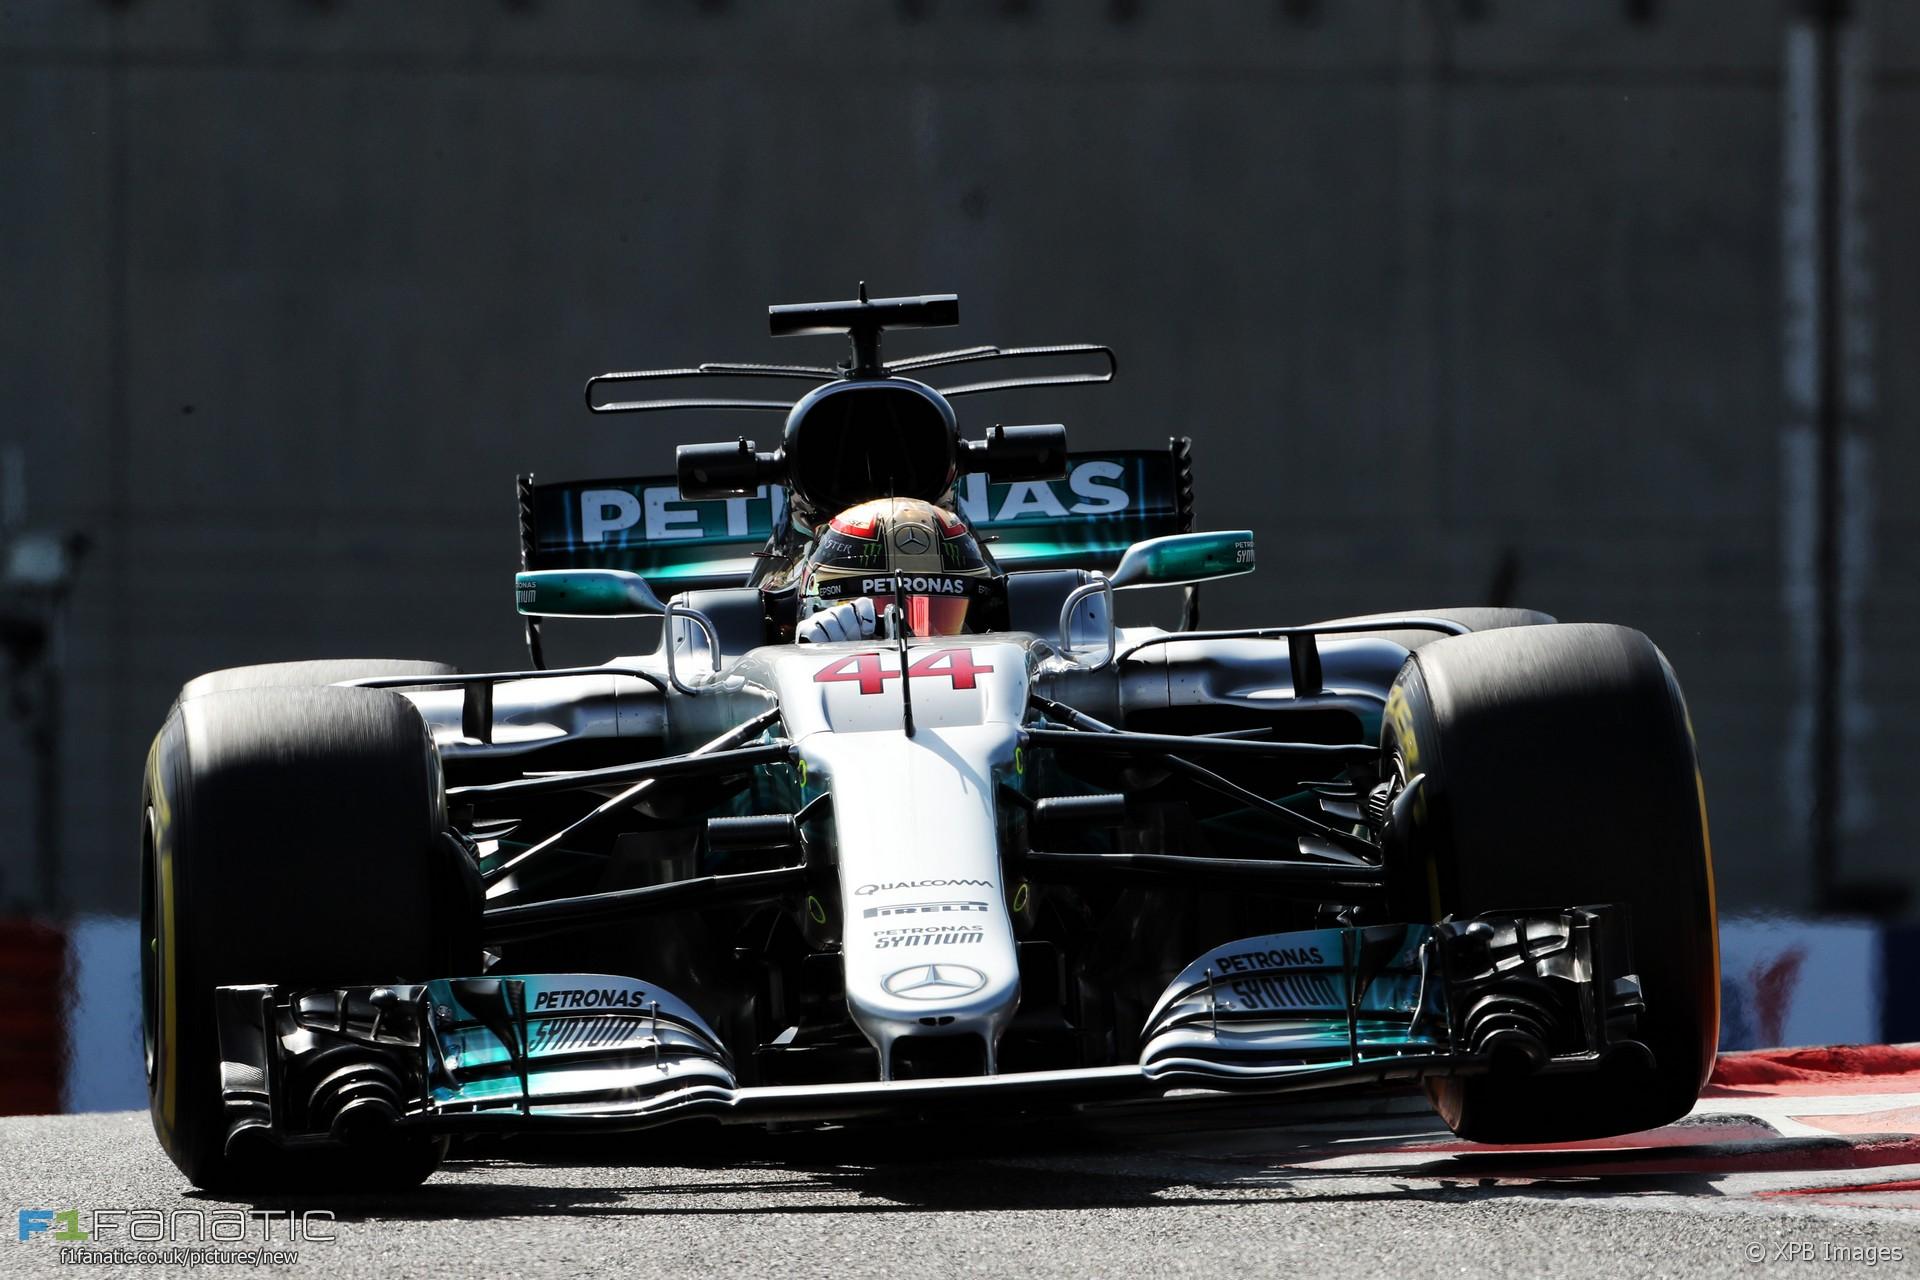 Lewis Hamilton, Mercedes, Yas Marina, 2017